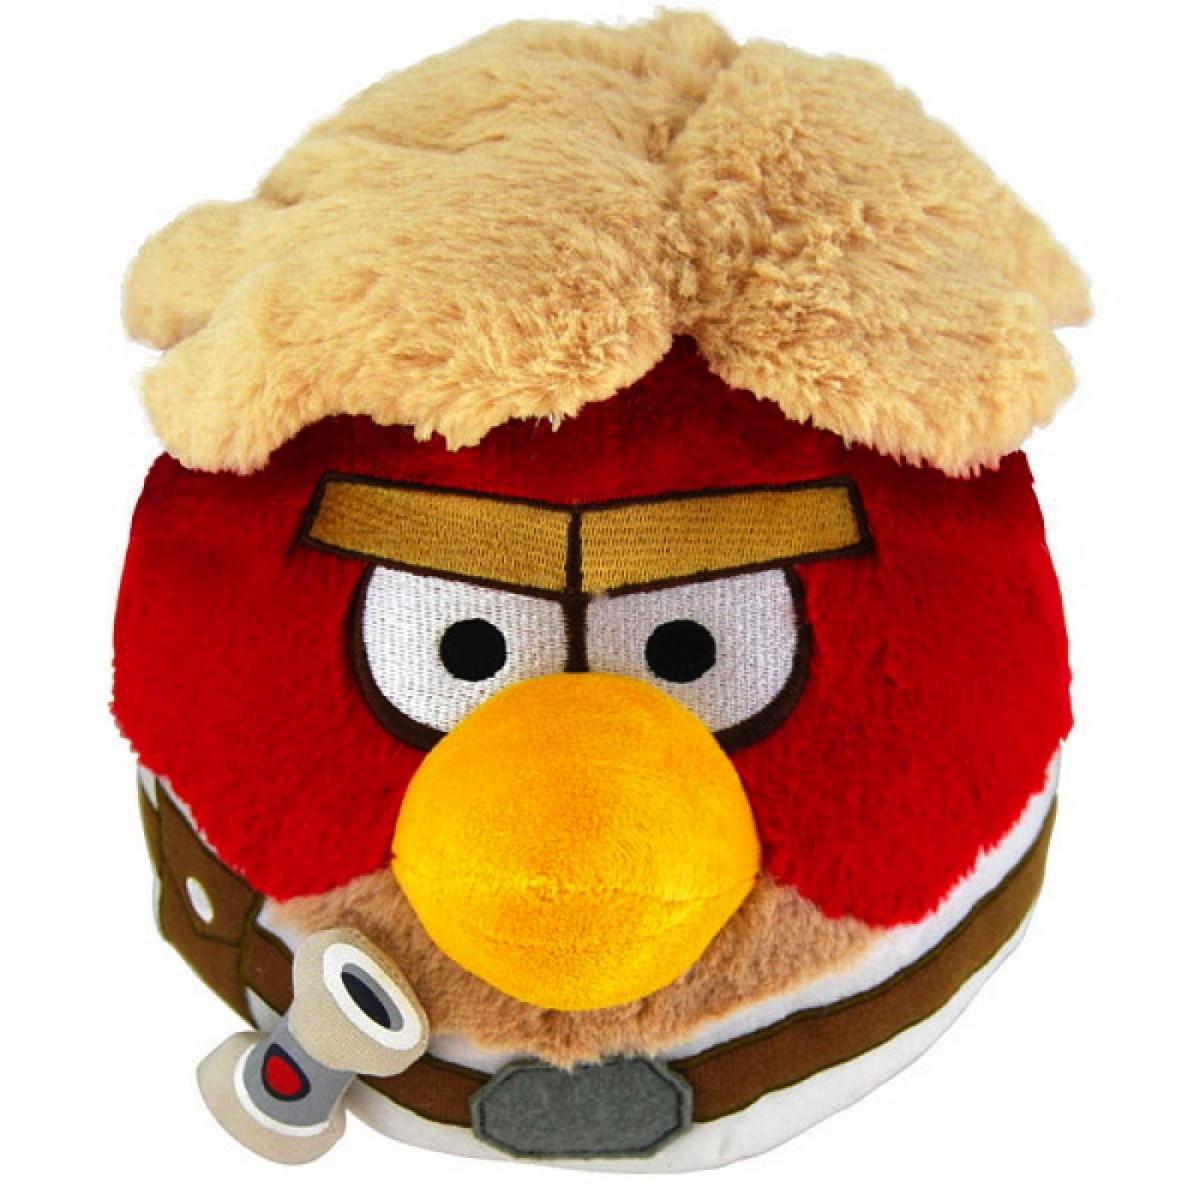 Angry Birds  20 cm-es Star Wars Luke Skywalker plüssfigura 5fc4e31dac